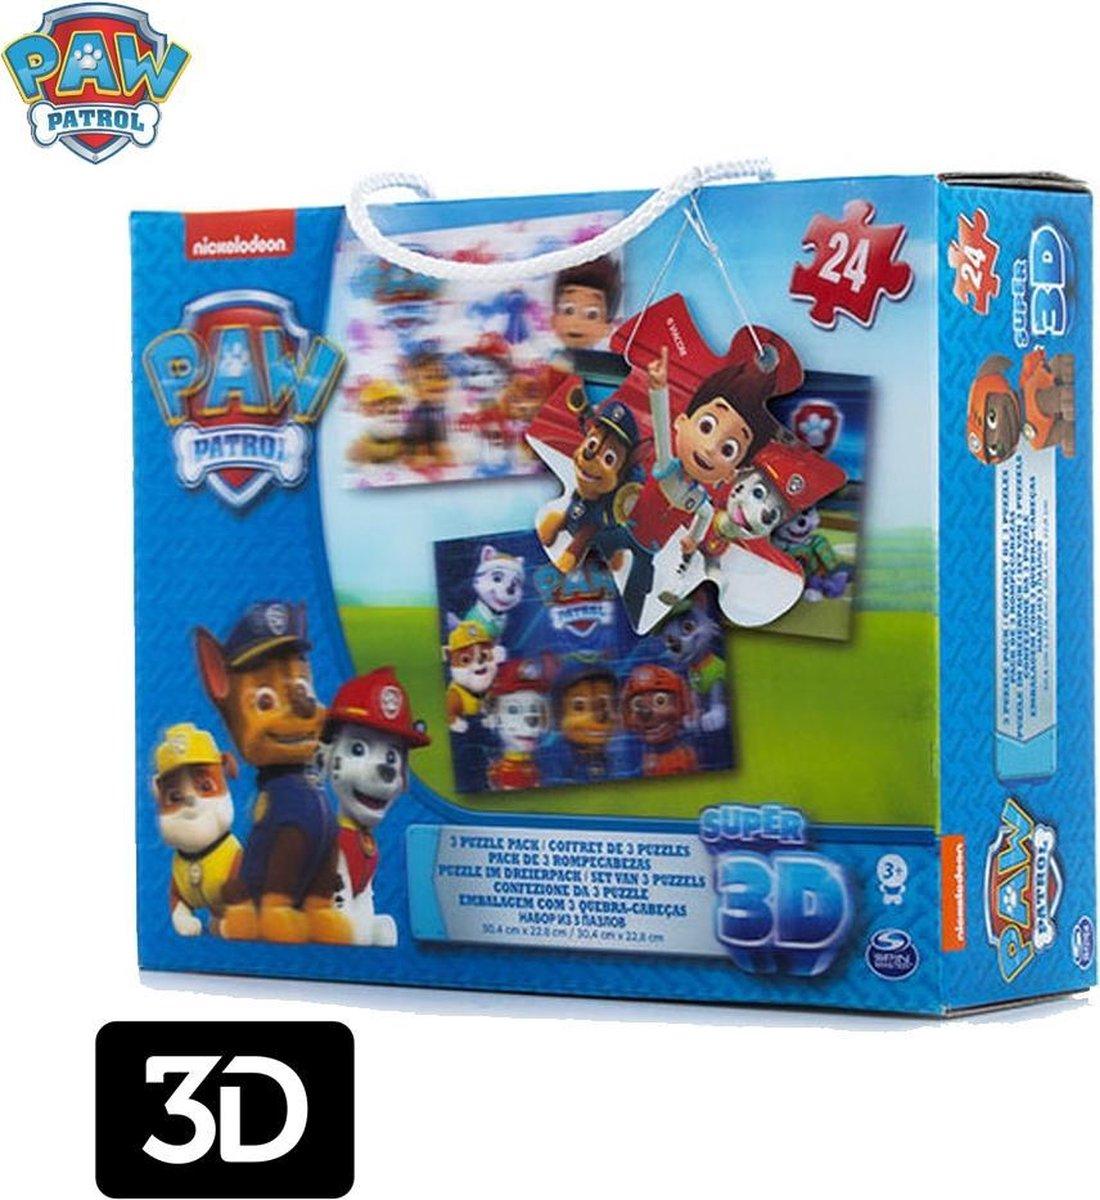 Paw Patrol Super 3D Puzzel Pack - Set Van 3 Puzzels